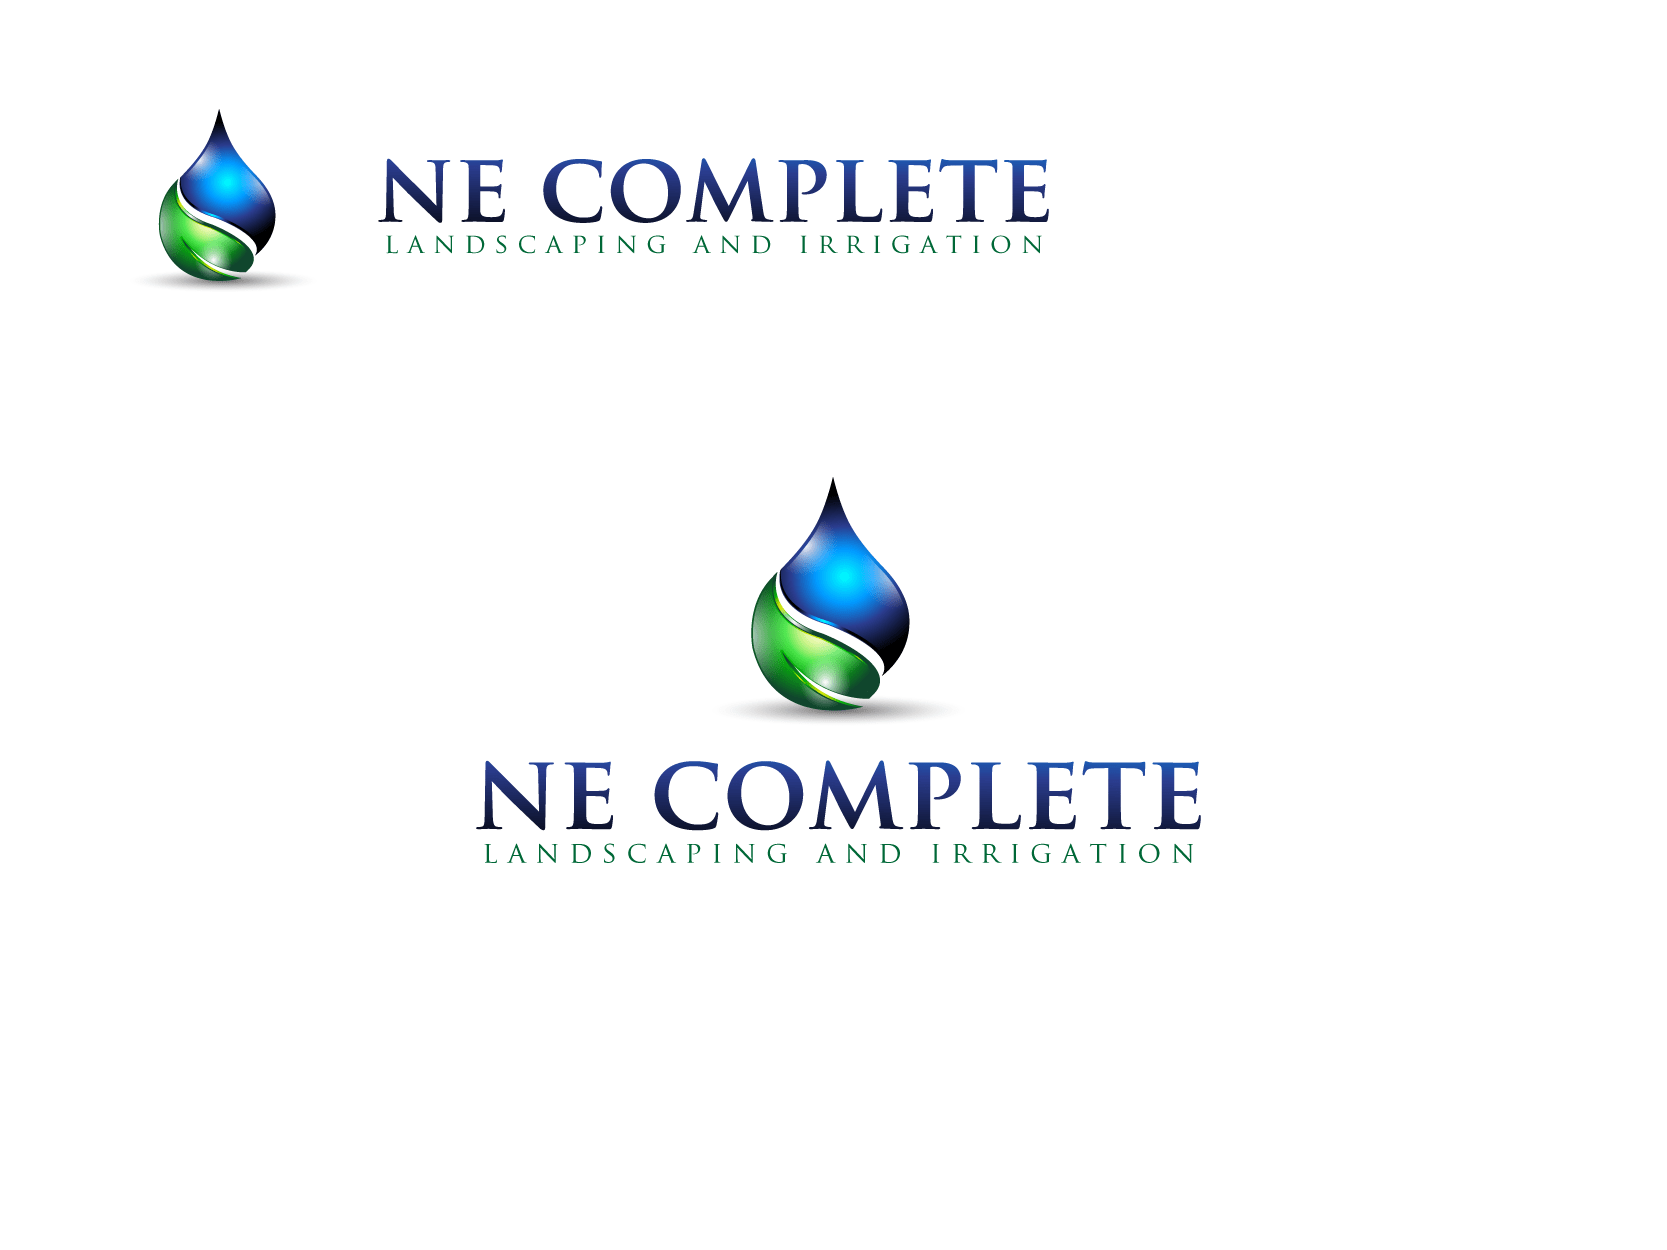 Emejing Landscape Logo Design Ideas Images - Decorating Interior ...